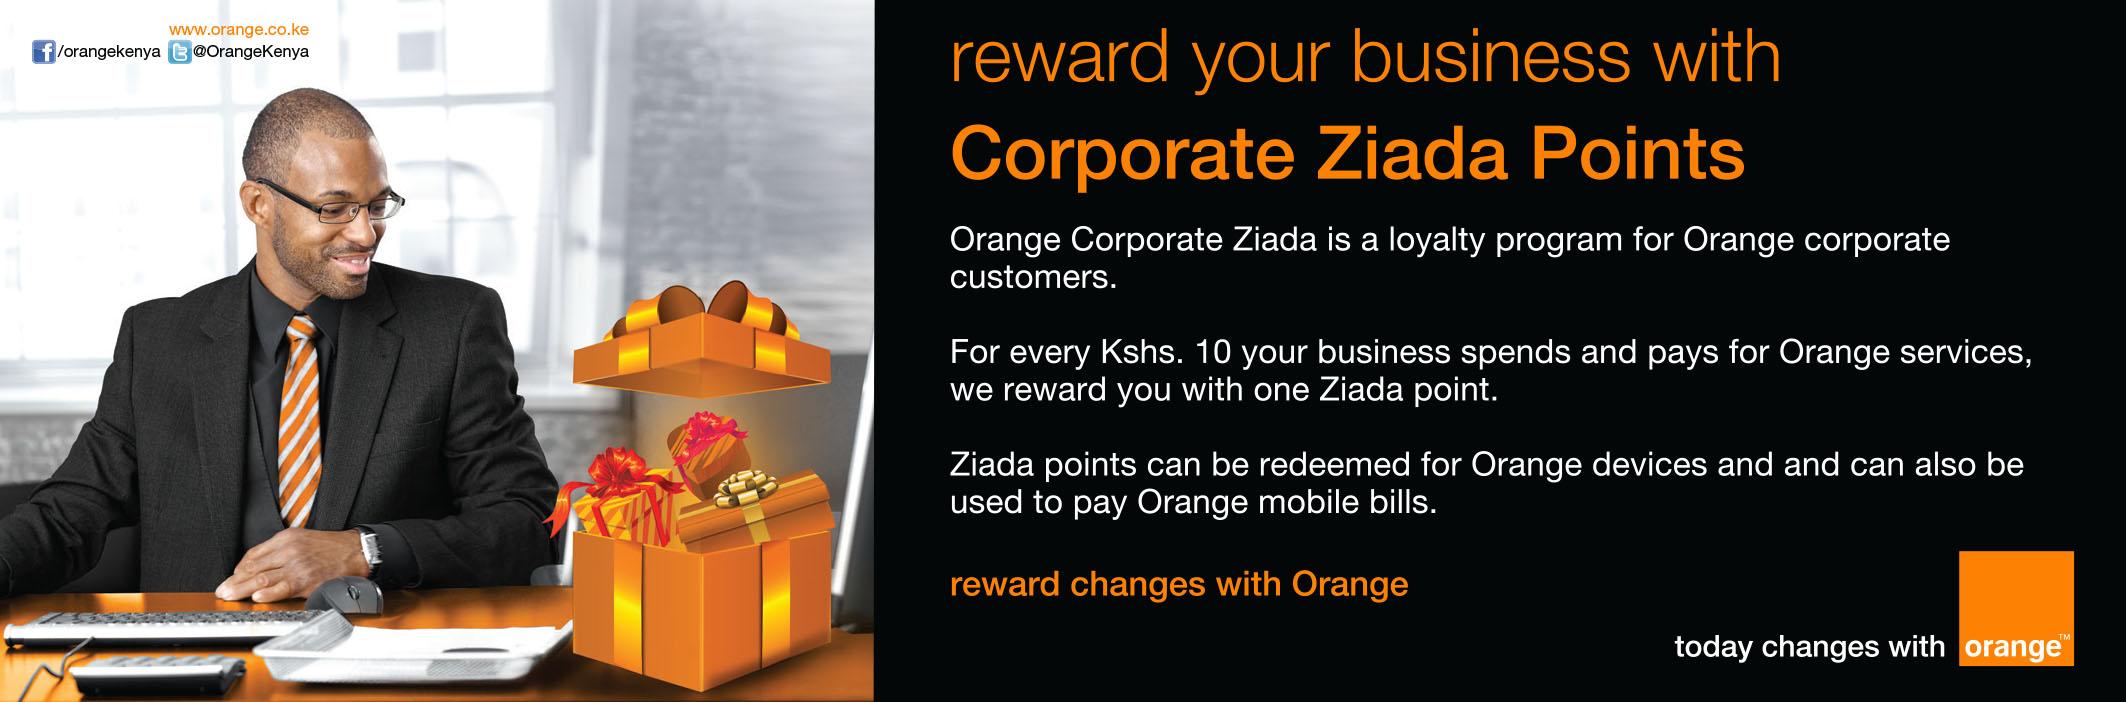 Corporate Ziada E-Shot 15th Oct